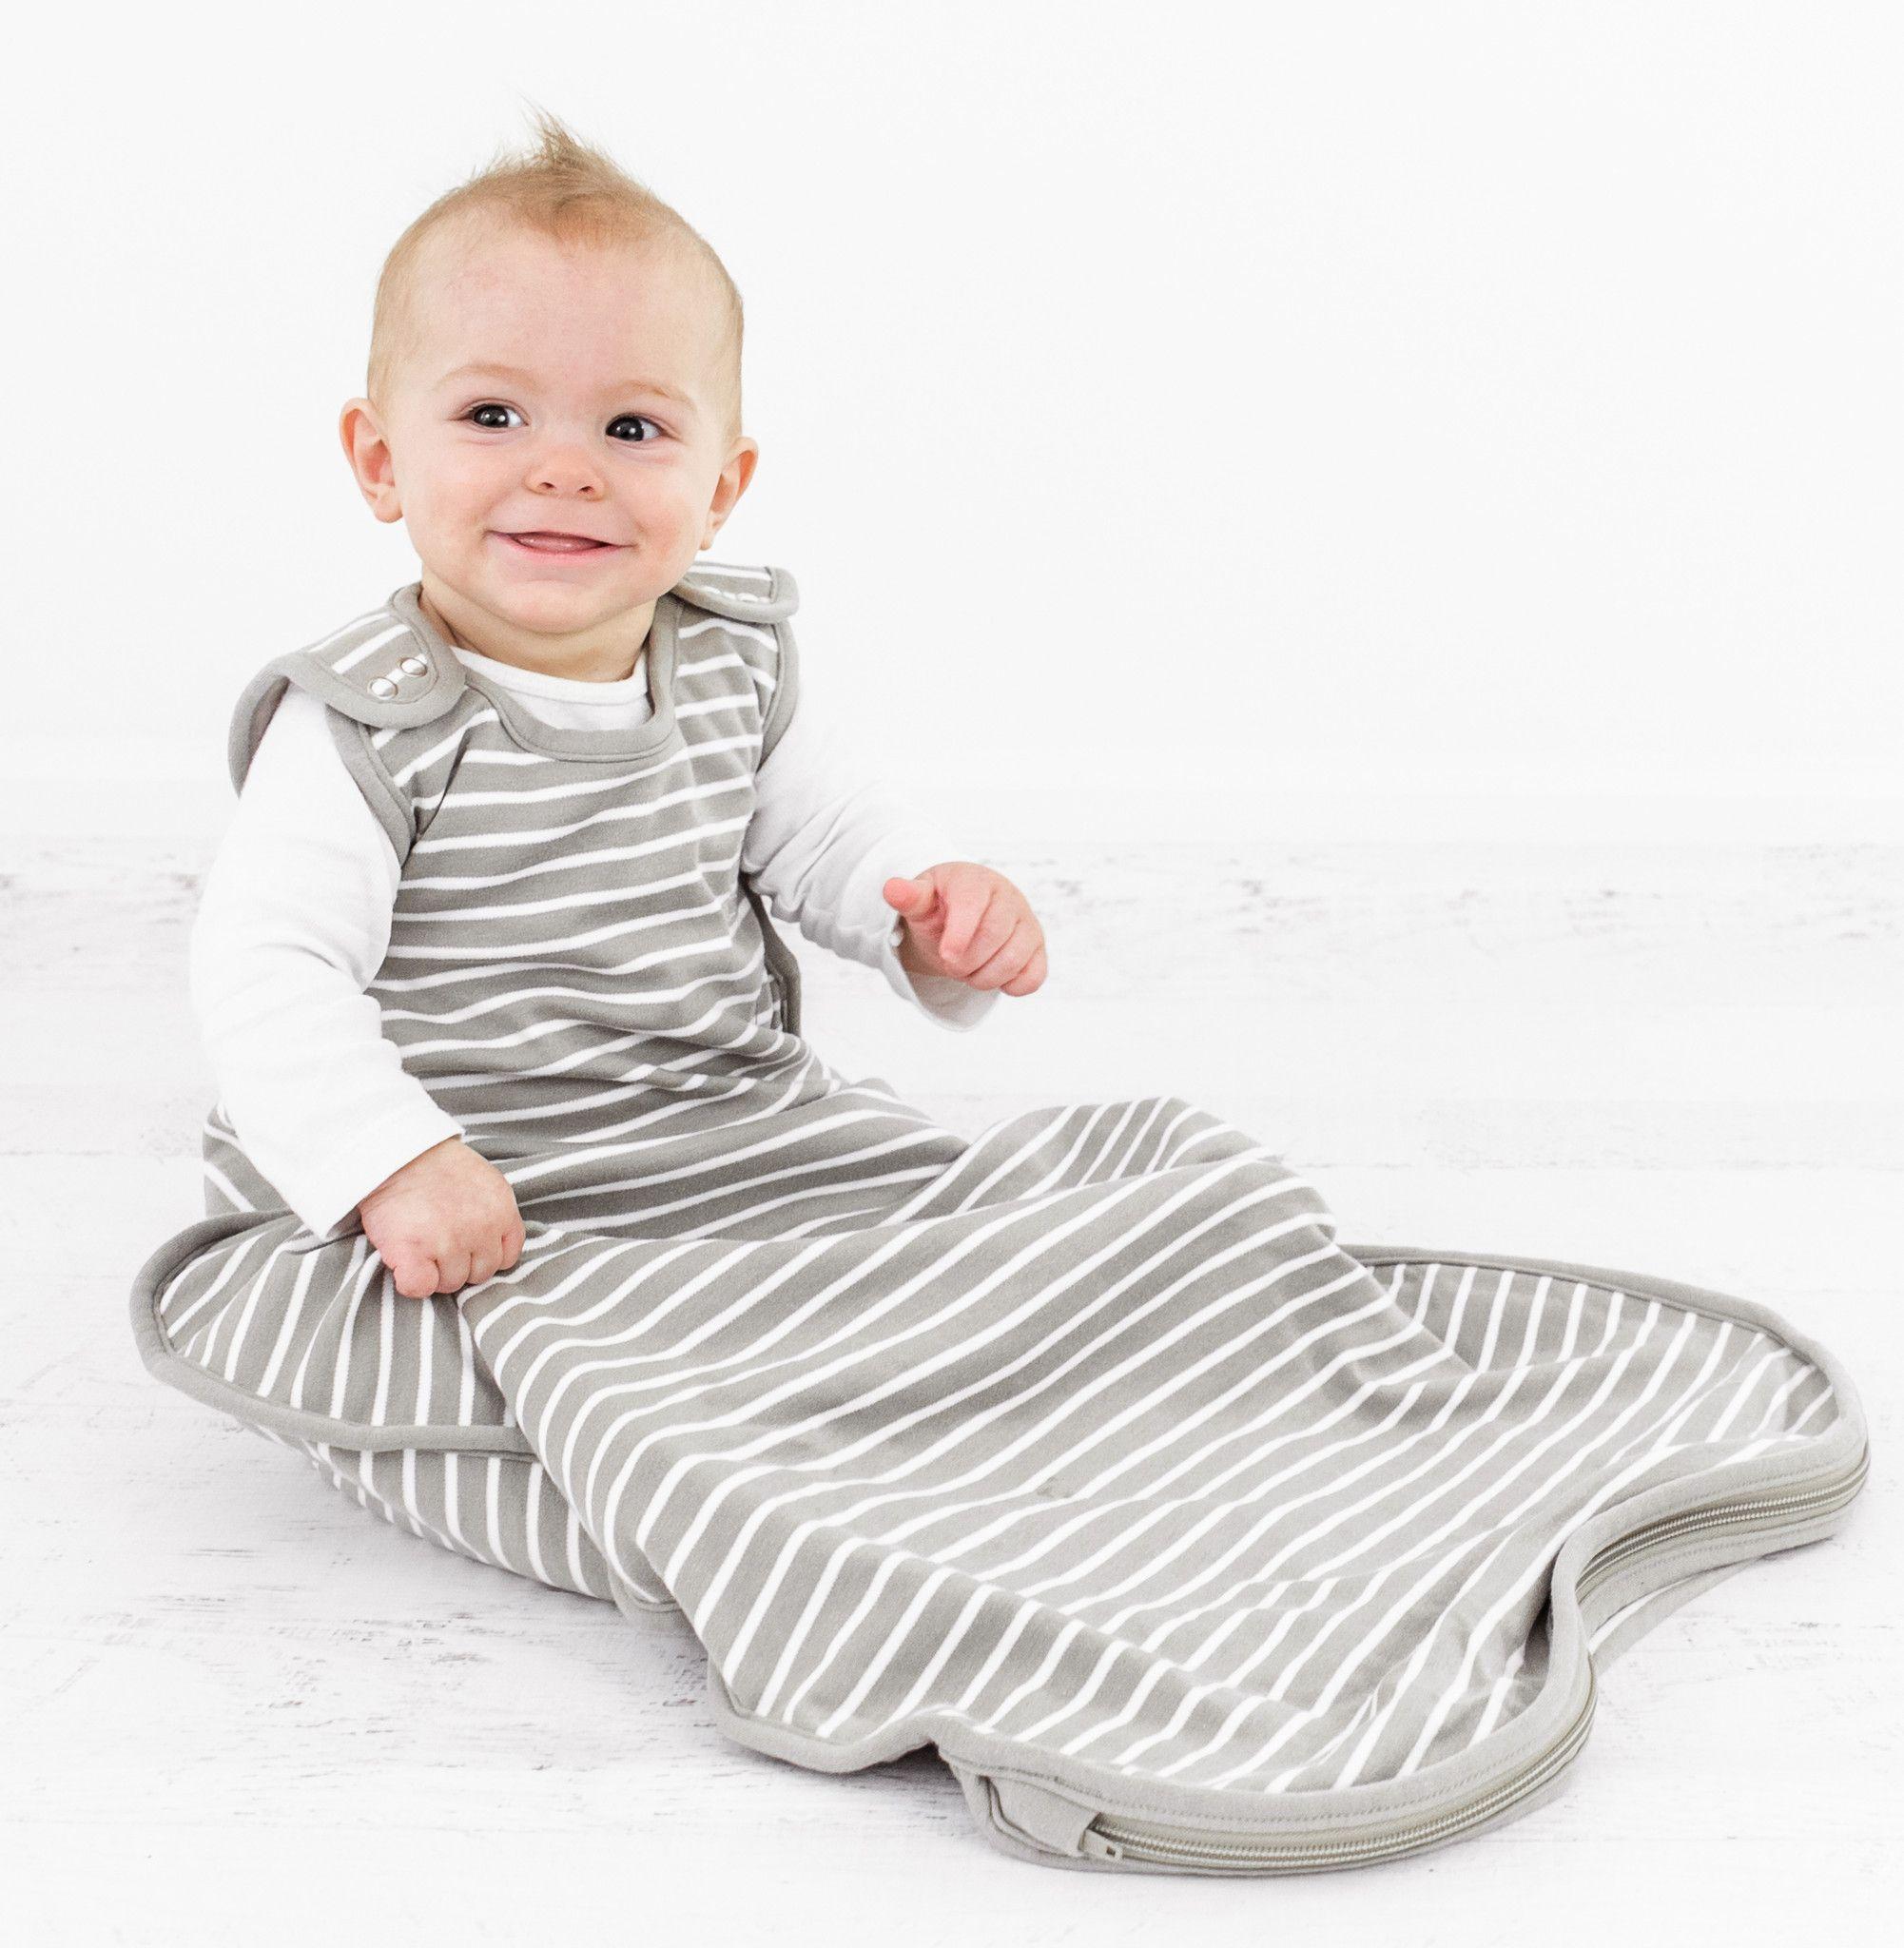 4 Season Baby Sleep Bag Merino Wool 2 Months